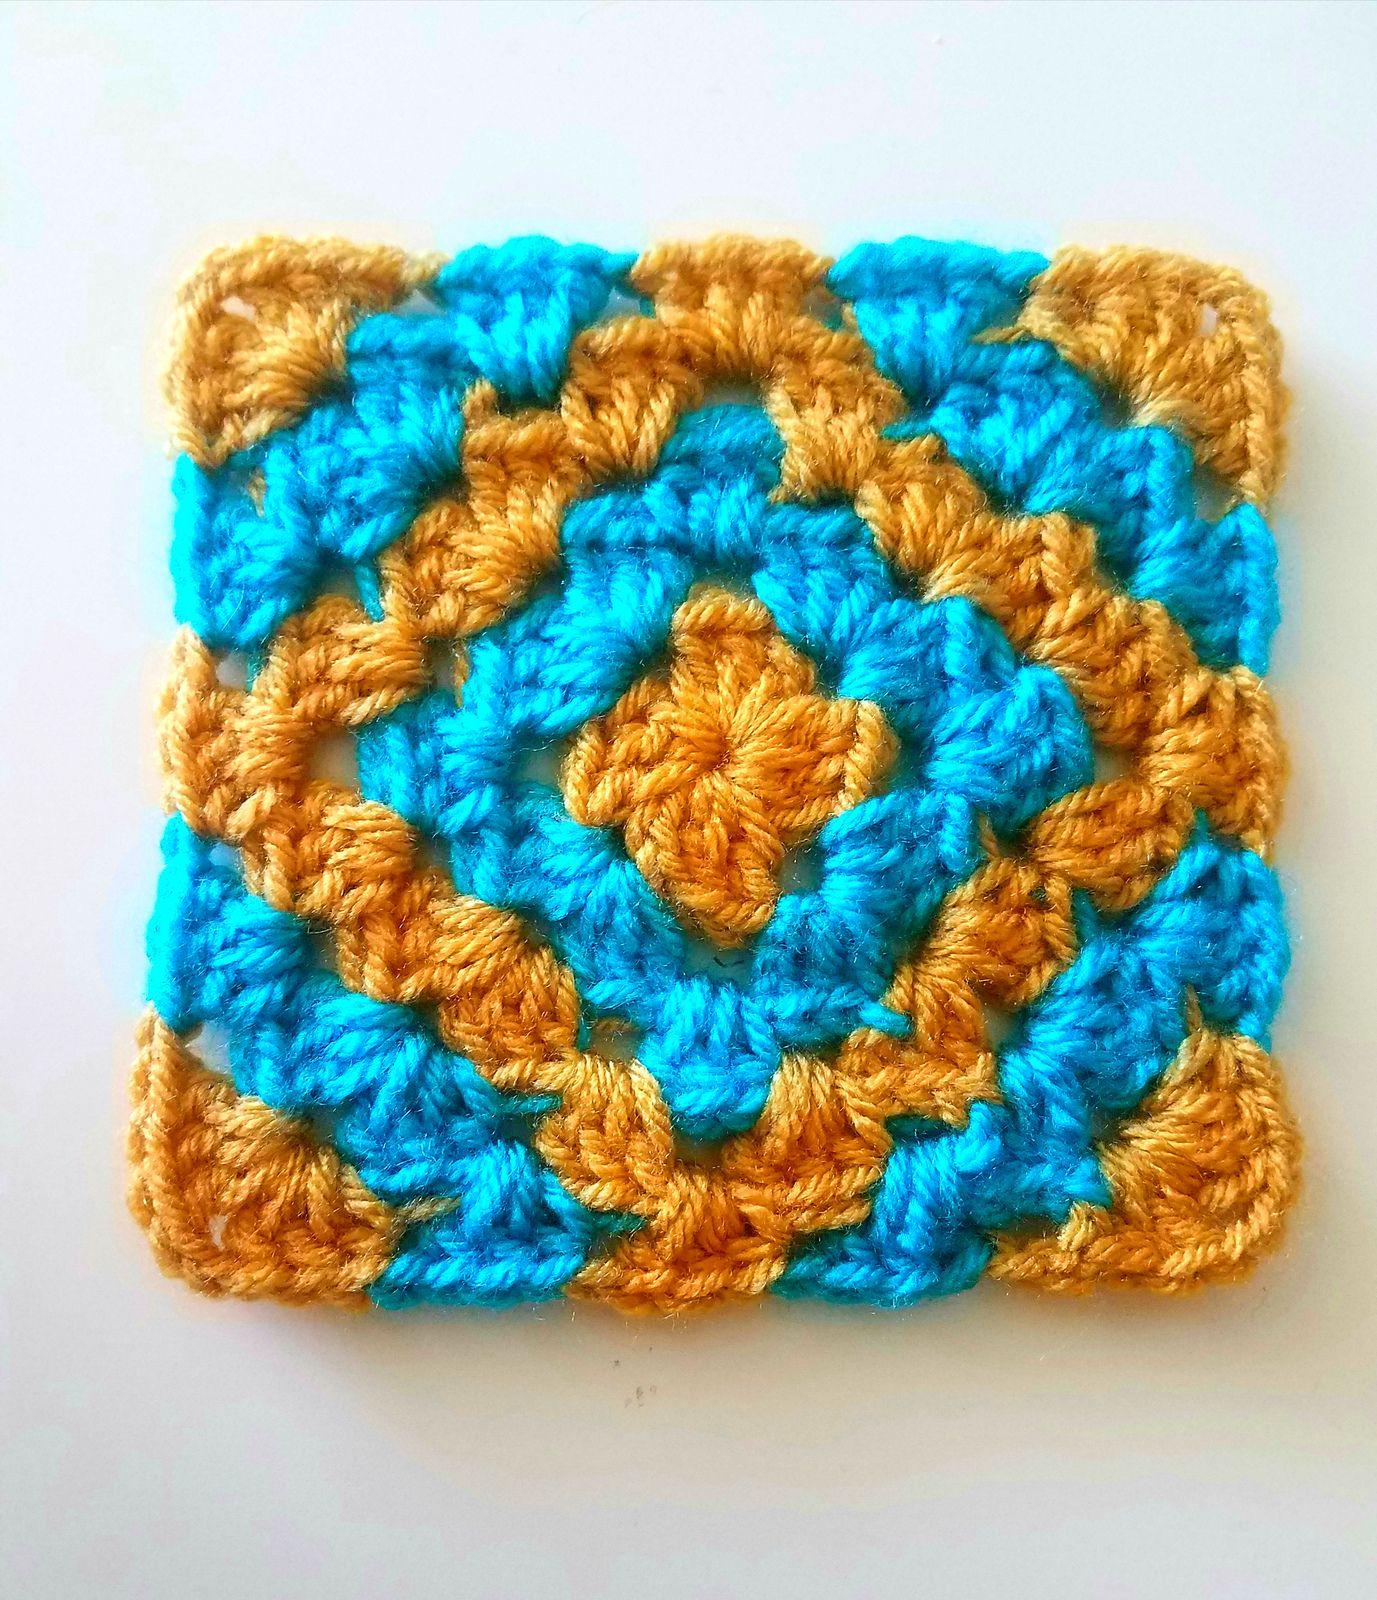 Ravelry: Boho diamond granny square by Six Hampton Crochet ...